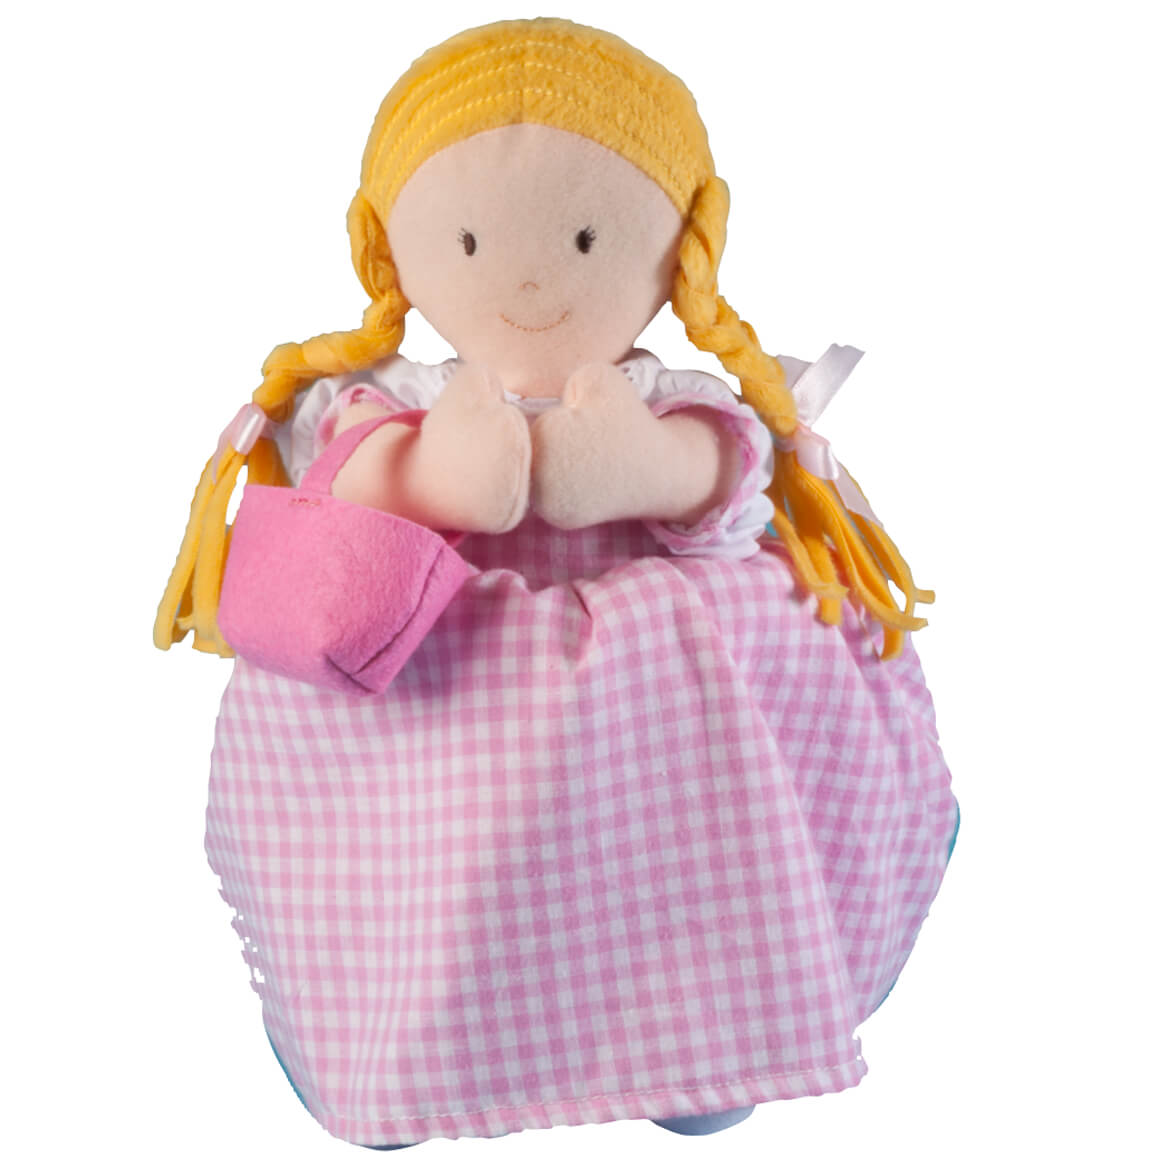 Bunny Girl Flip Doll-354284